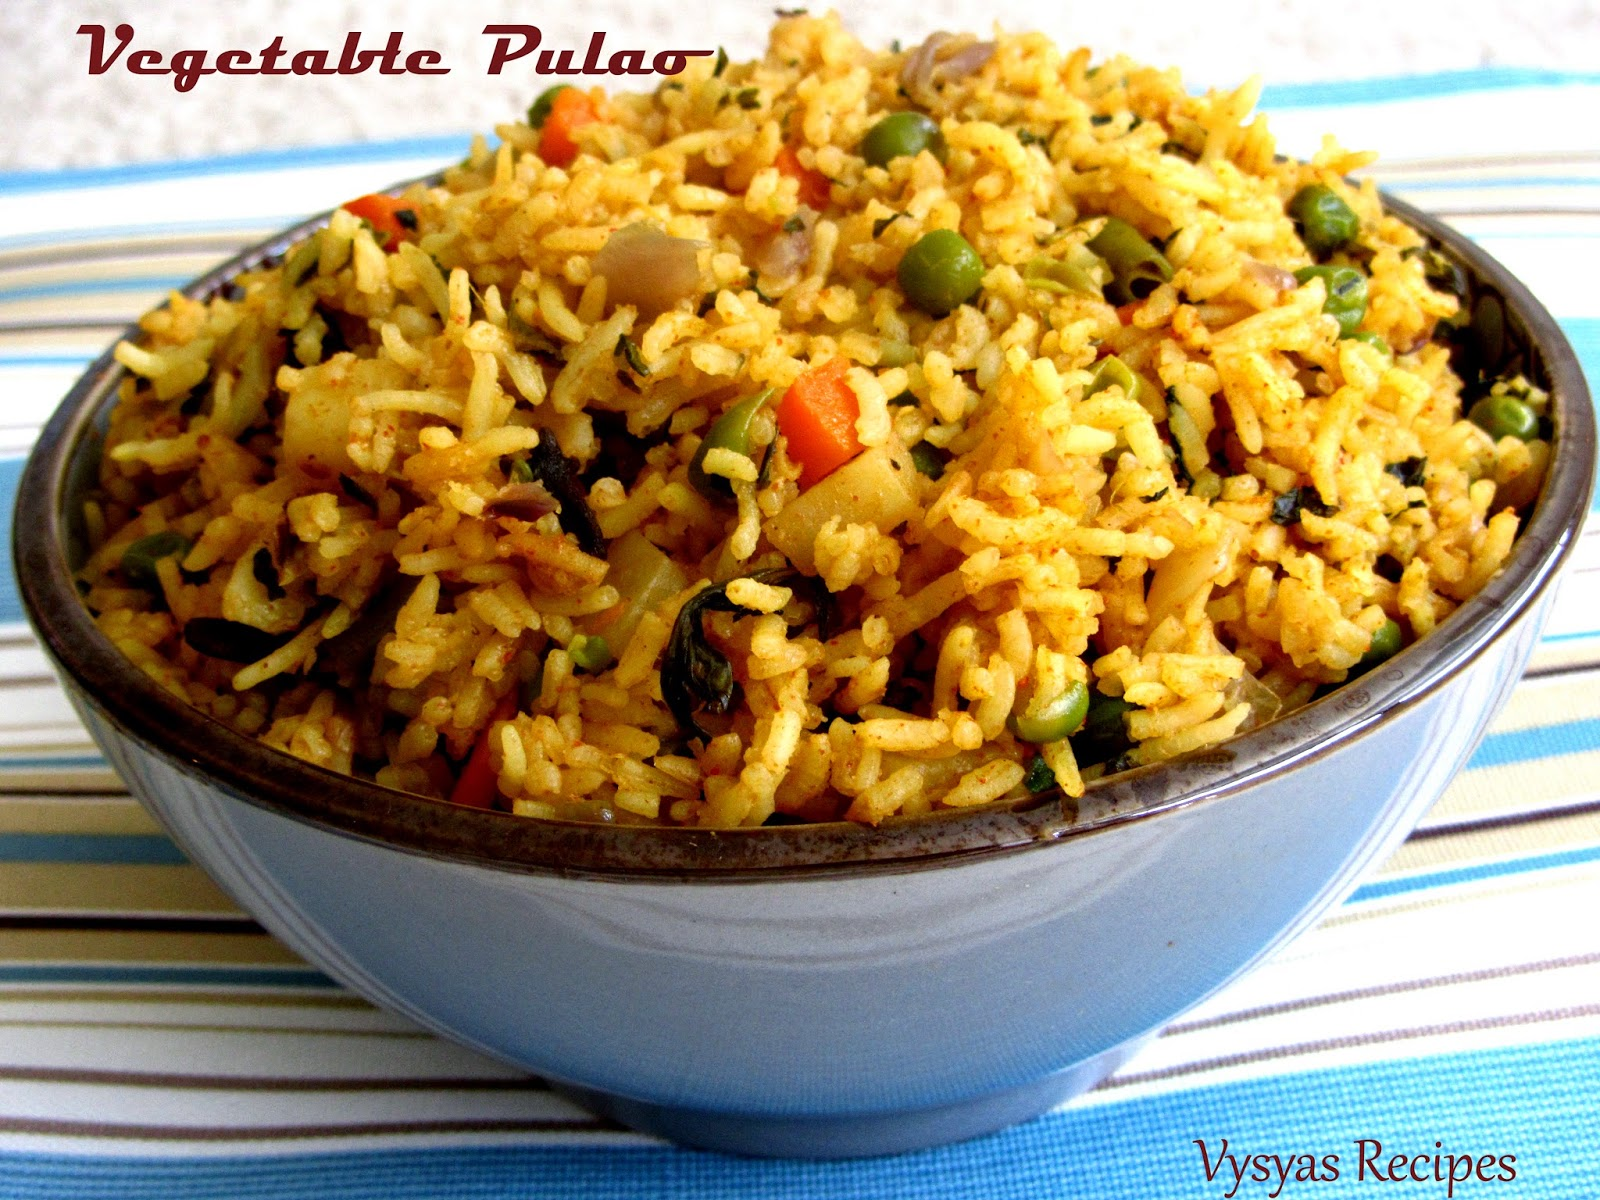 ... recipes: Vegetable Pulao Recipe - Spicy Vegetable Pulao Recipe